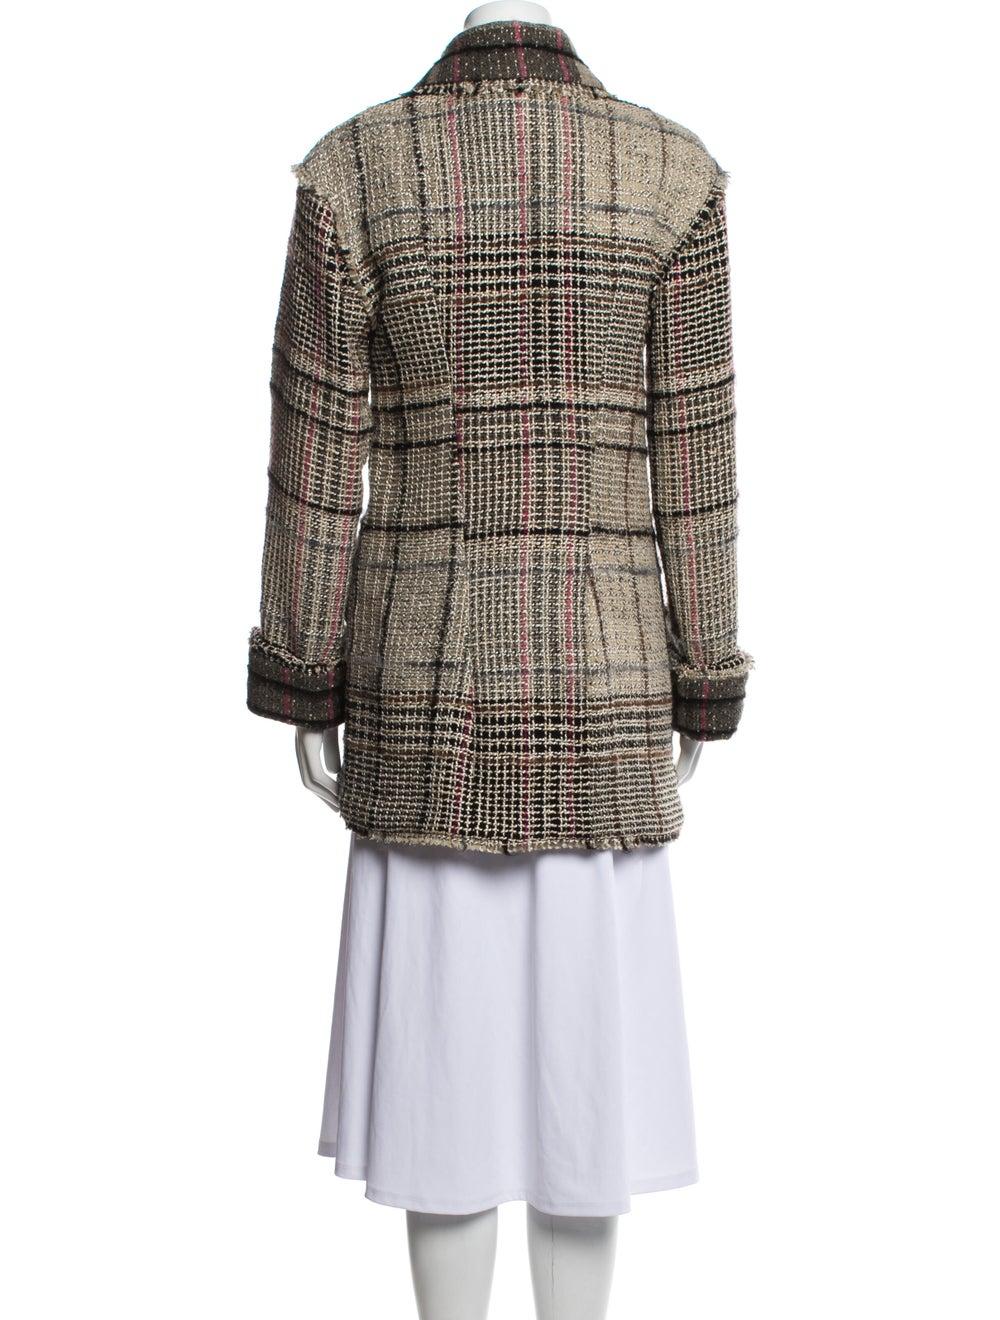 Chanel Vintage 2005 Faux Fur Jacket - image 3